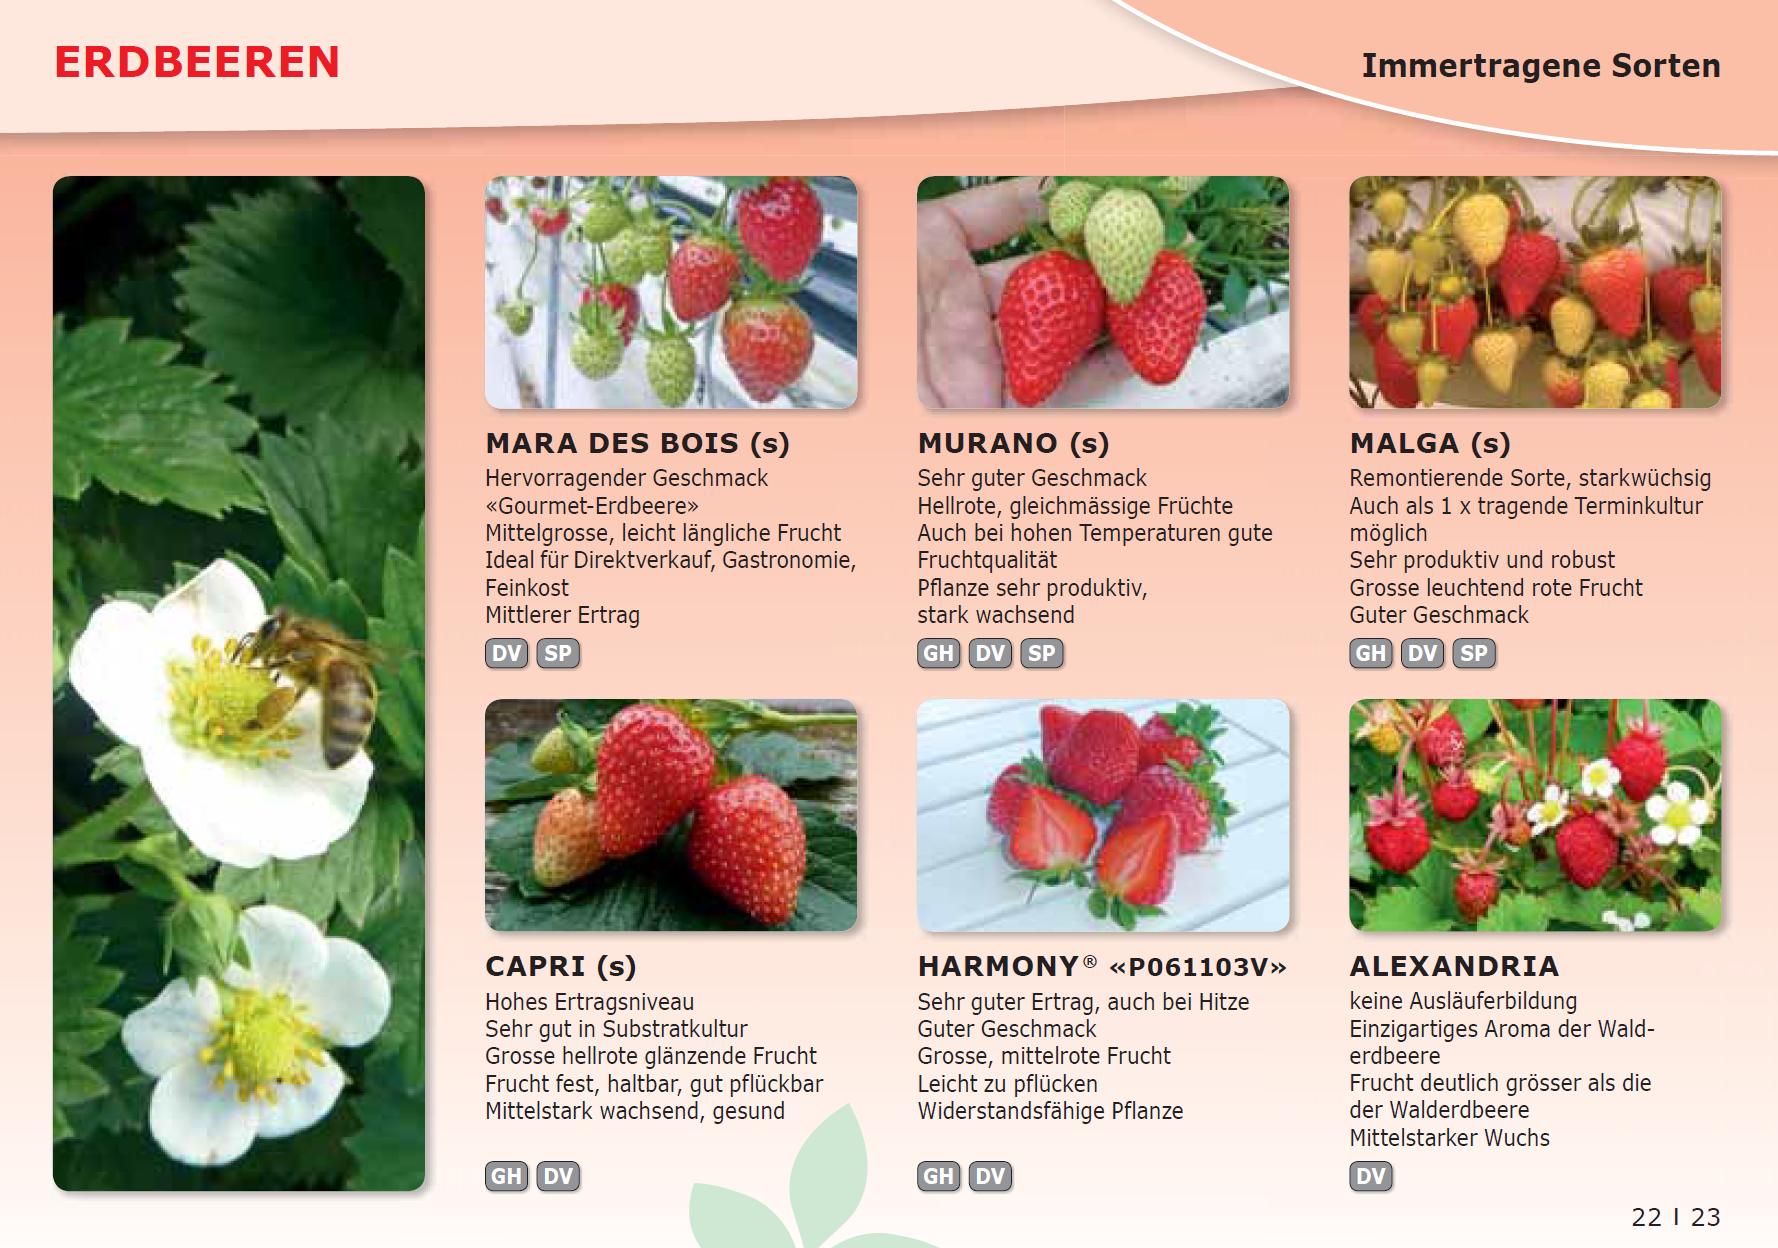 Hengartner Pflanzen Gmbh Erdbeeren Neukirch Egnach